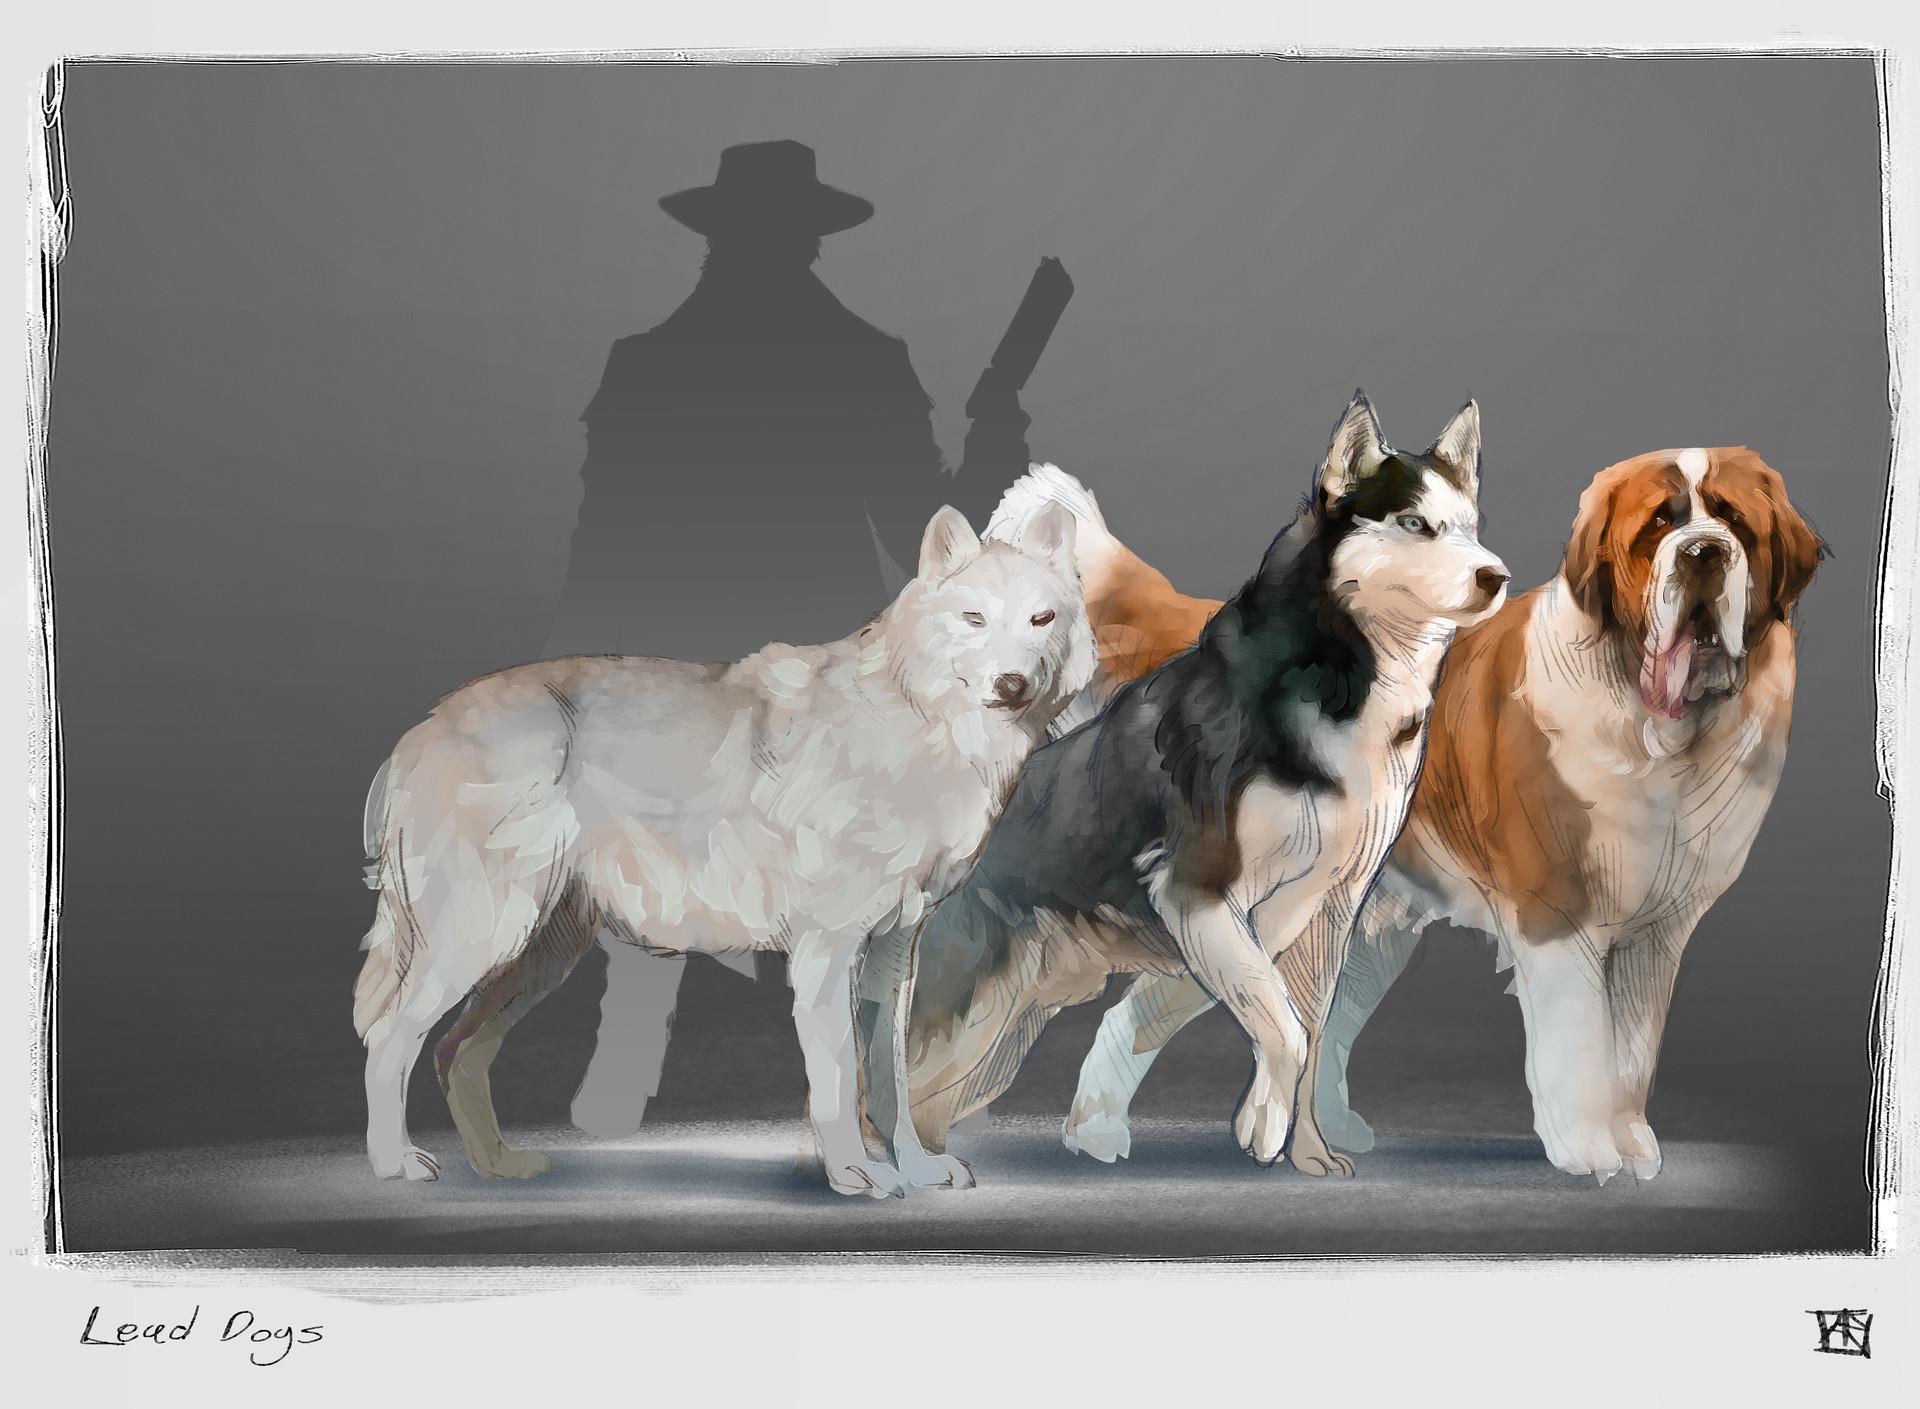 Alejandro arevalo lex dogs